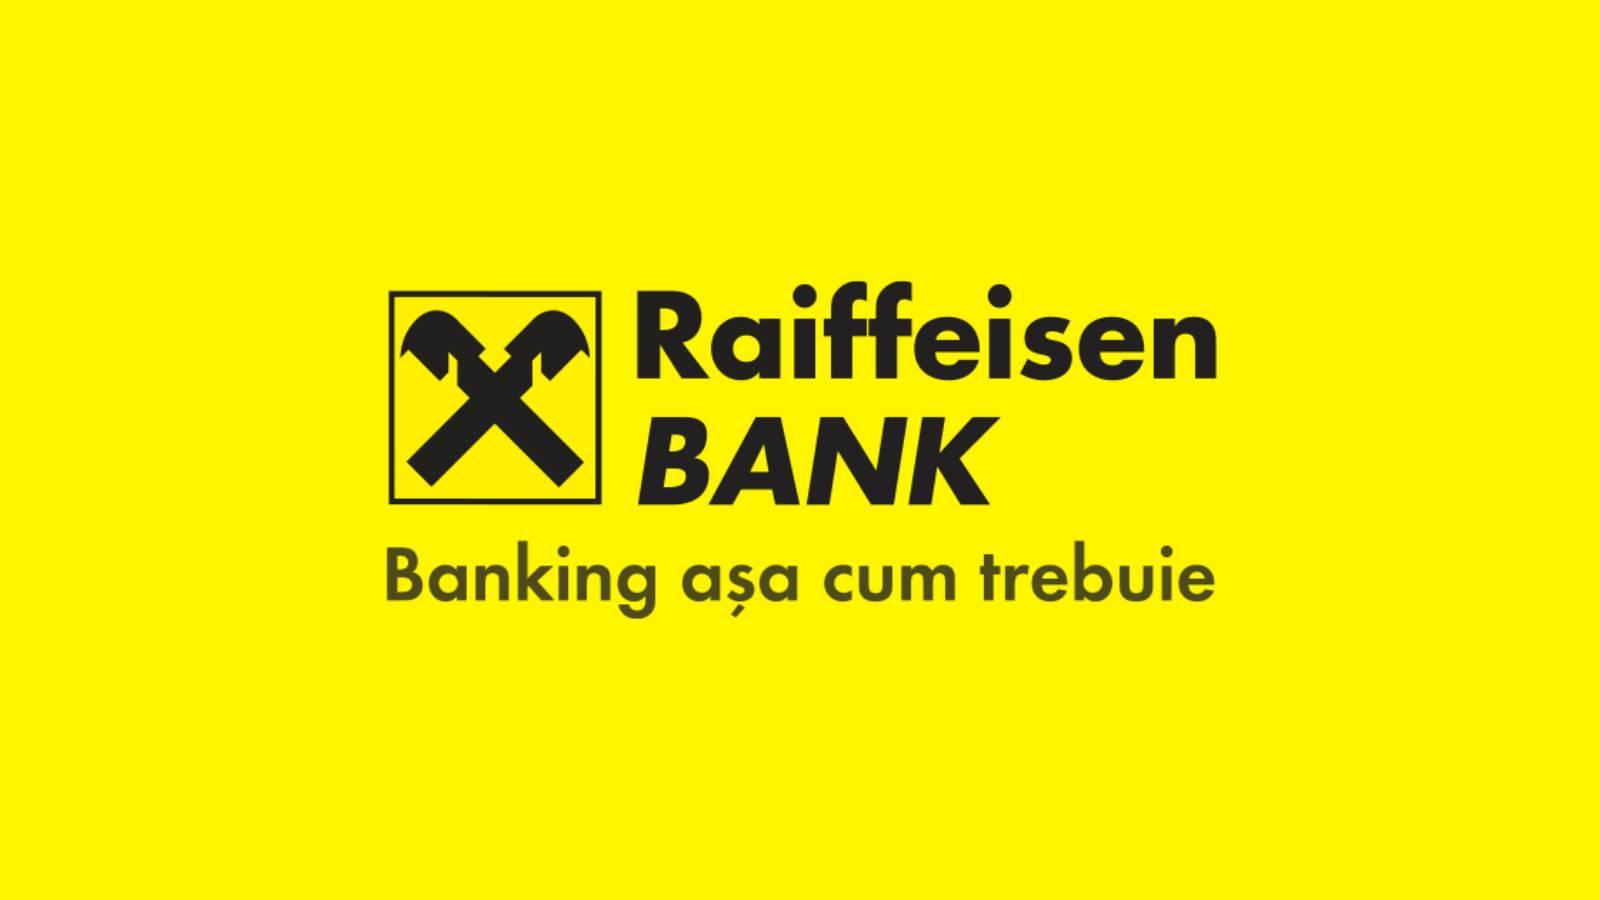 Raiffeisen Bank grama